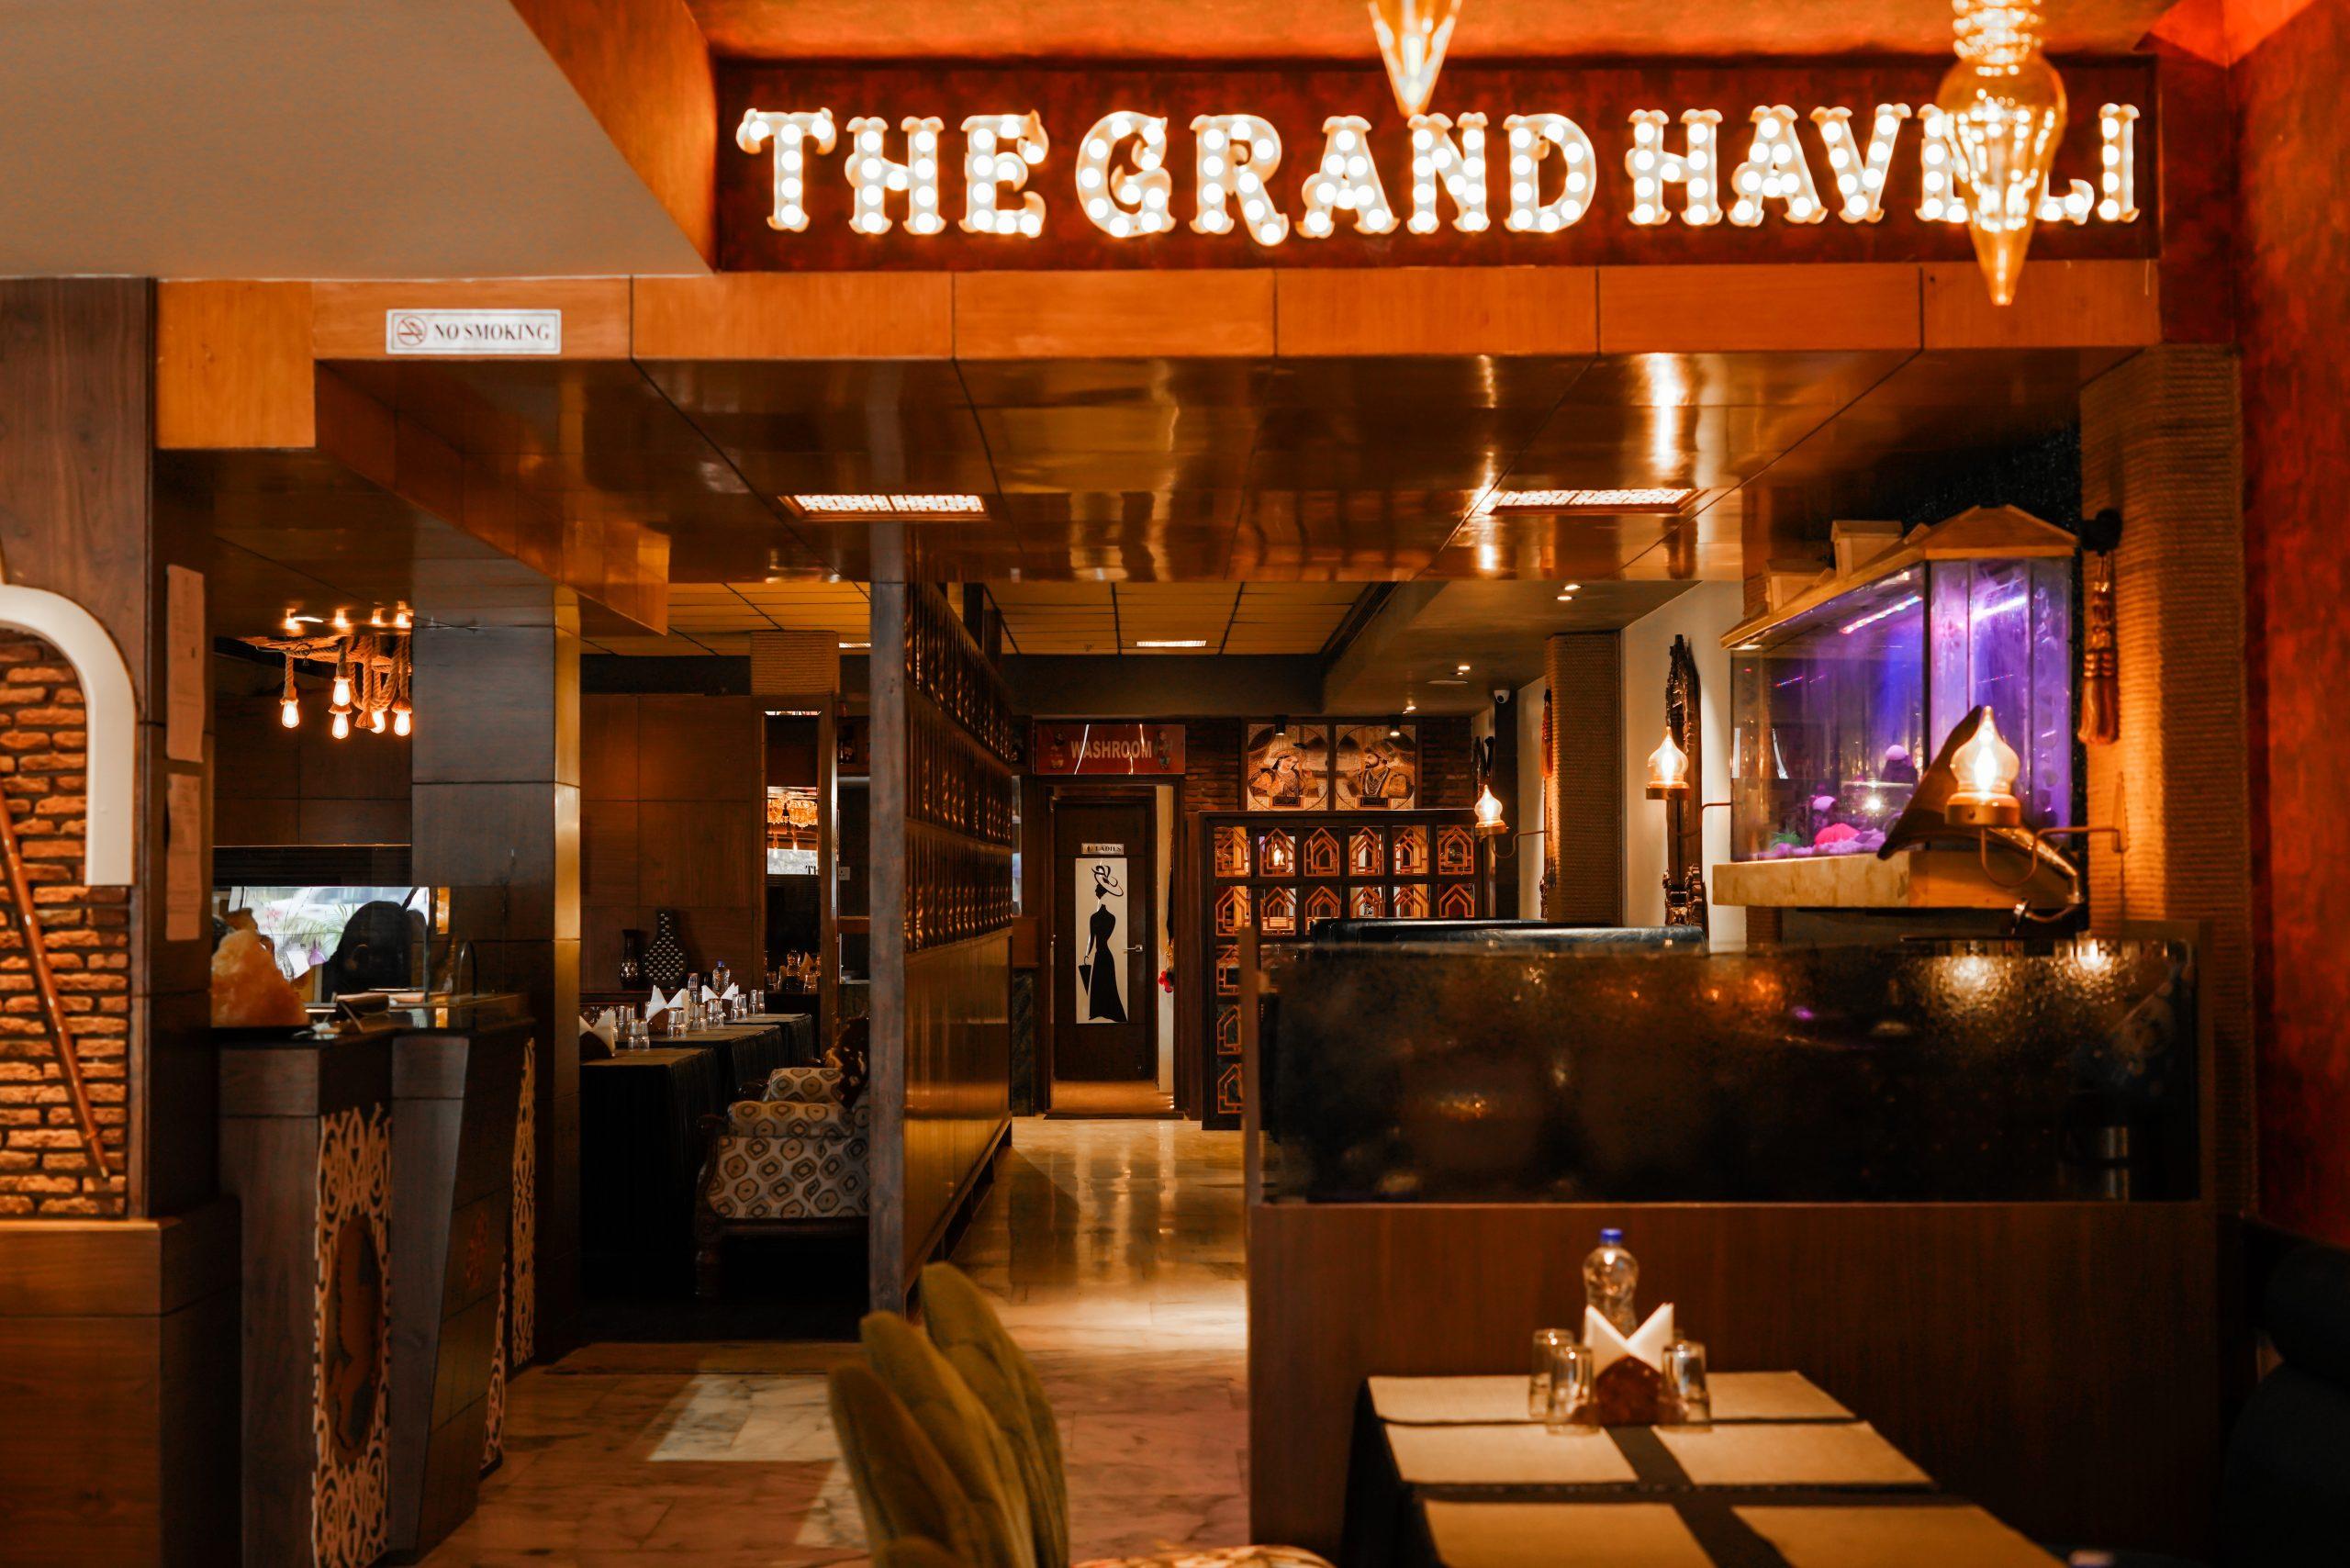 The Grand Haveli Restaurant